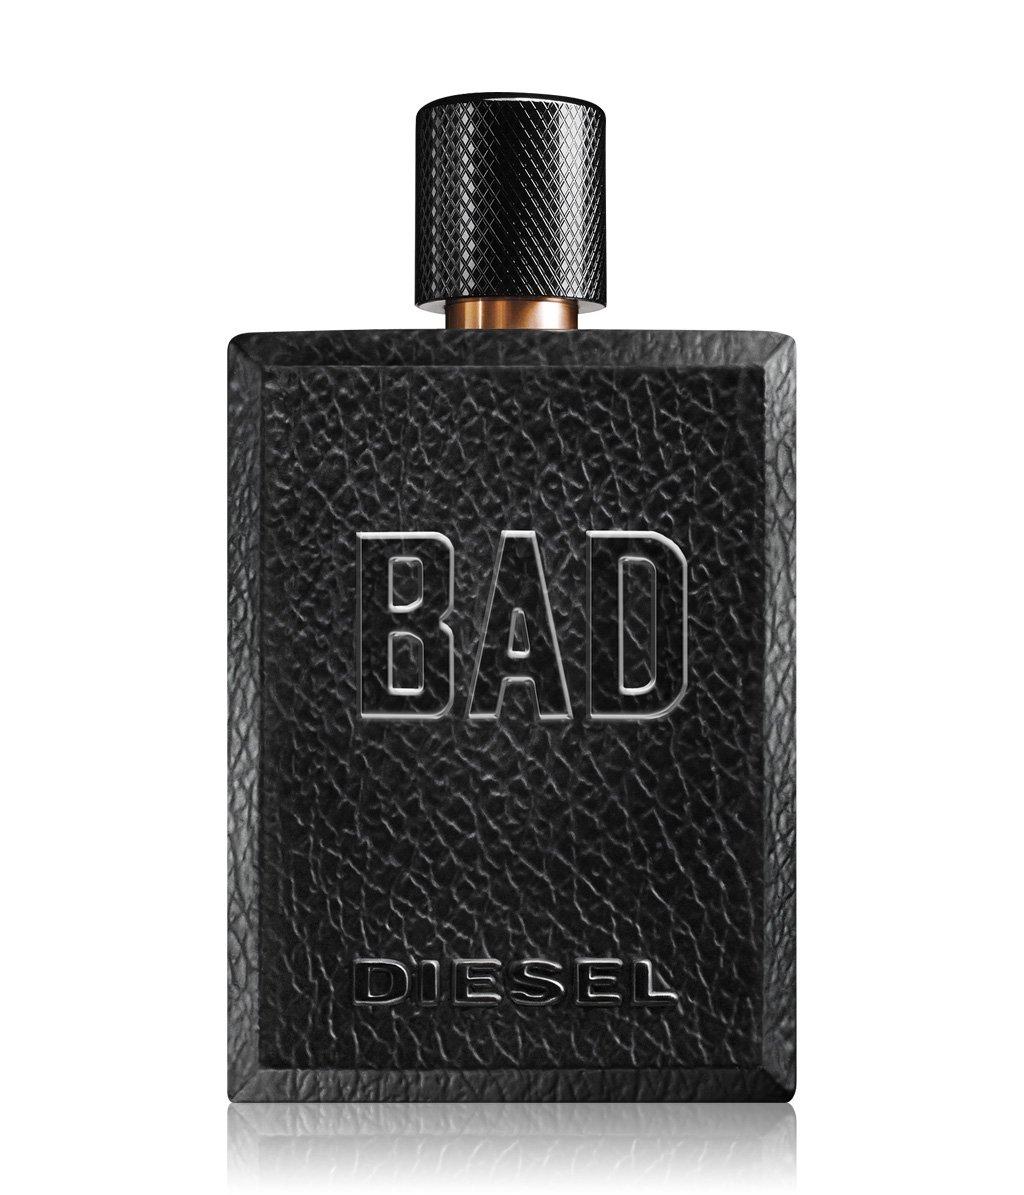 diesel bad parfum online bestellen flaconi. Black Bedroom Furniture Sets. Home Design Ideas